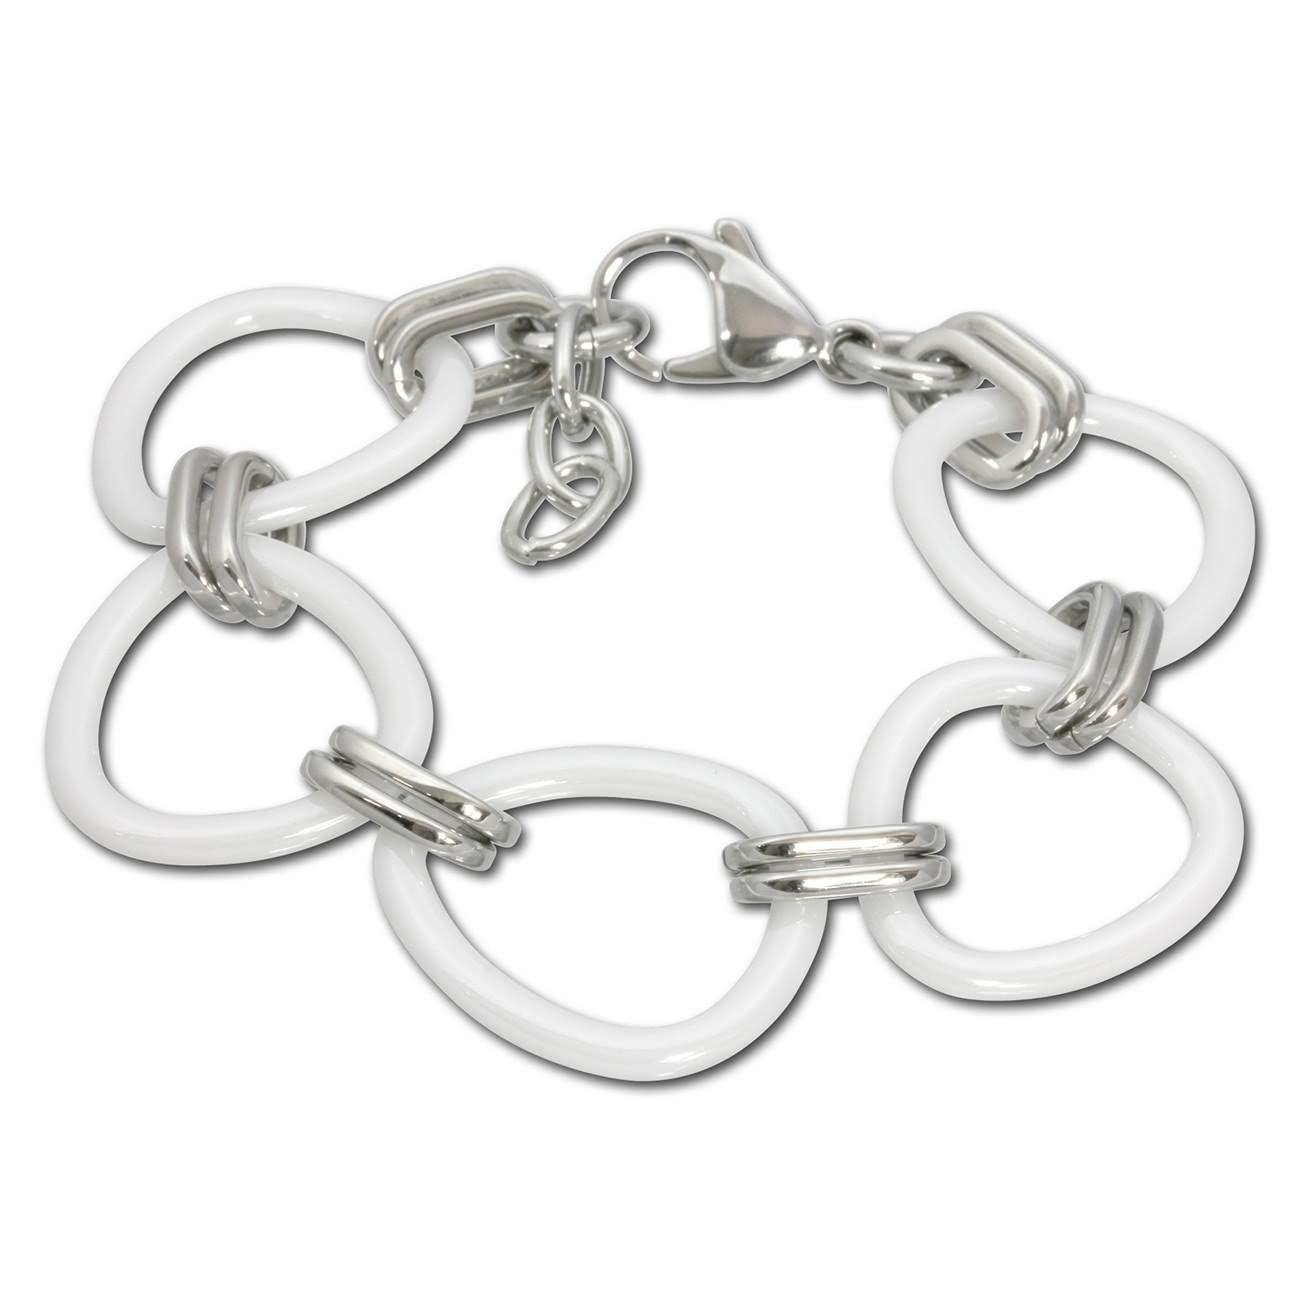 Amello Armband Keramik Dreiecke weiß Damen Edelstahlschmuck ESAX07W